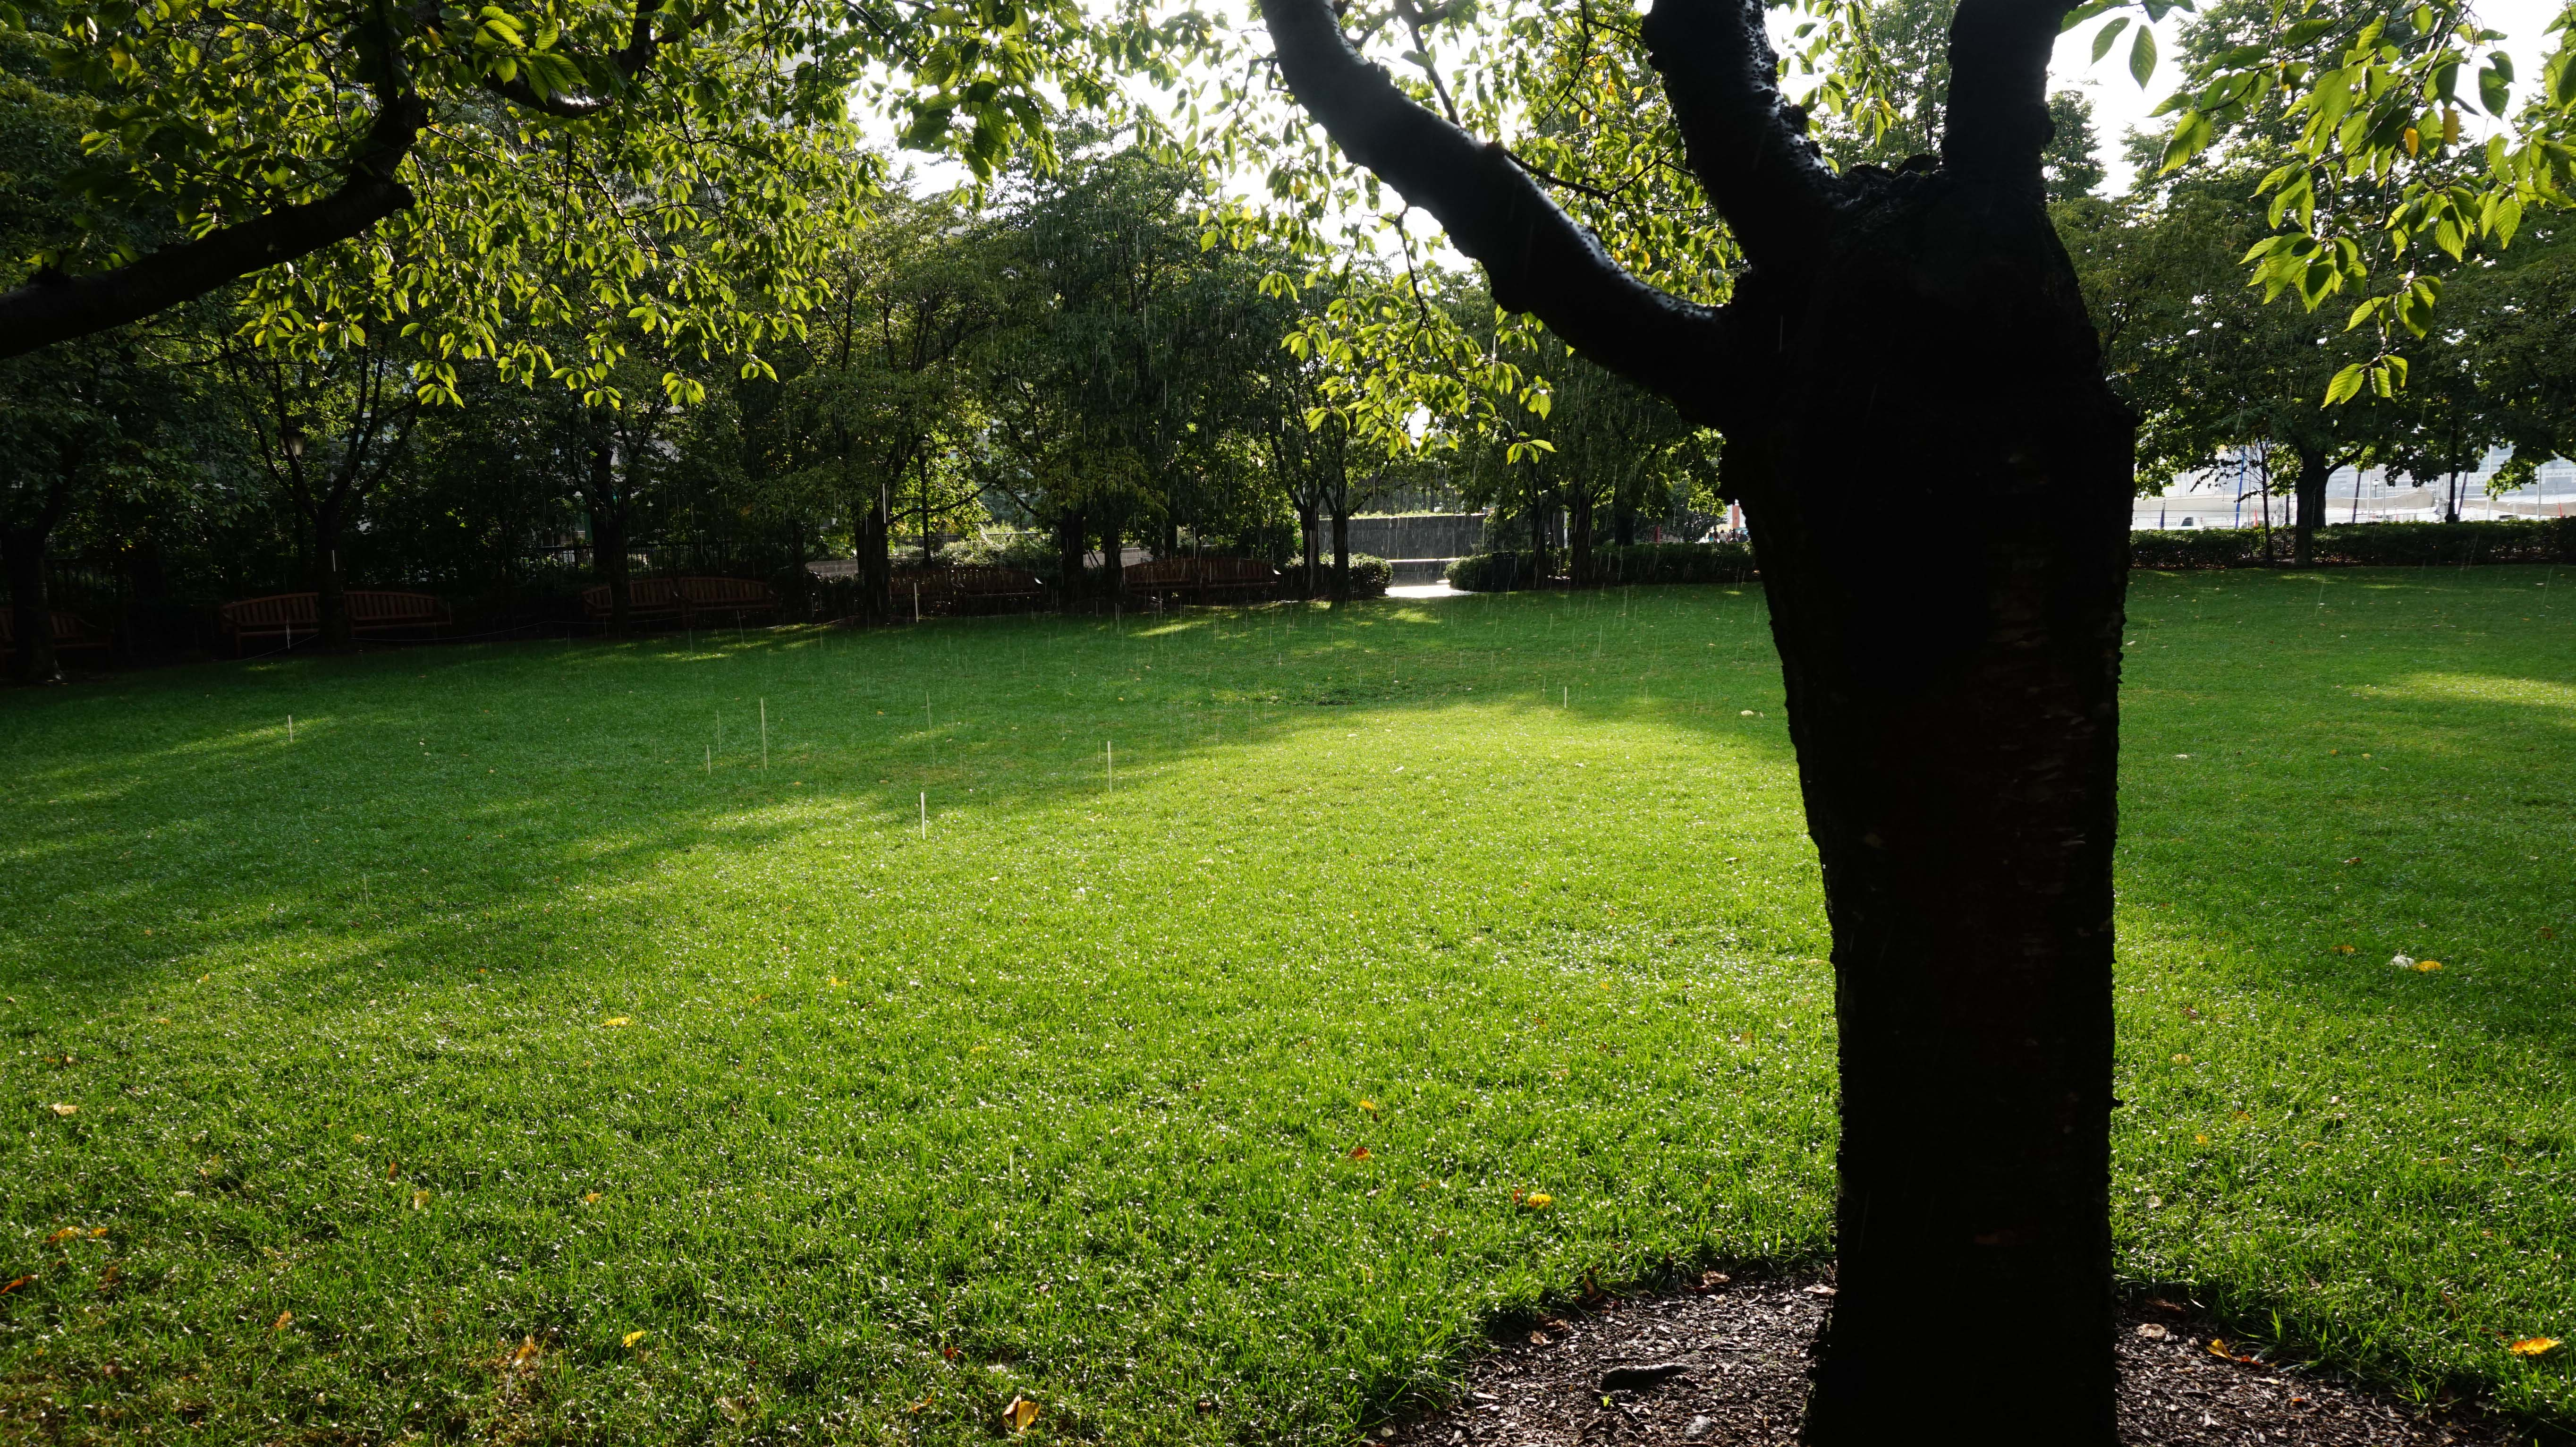 Rain in Cherry Tree lawn